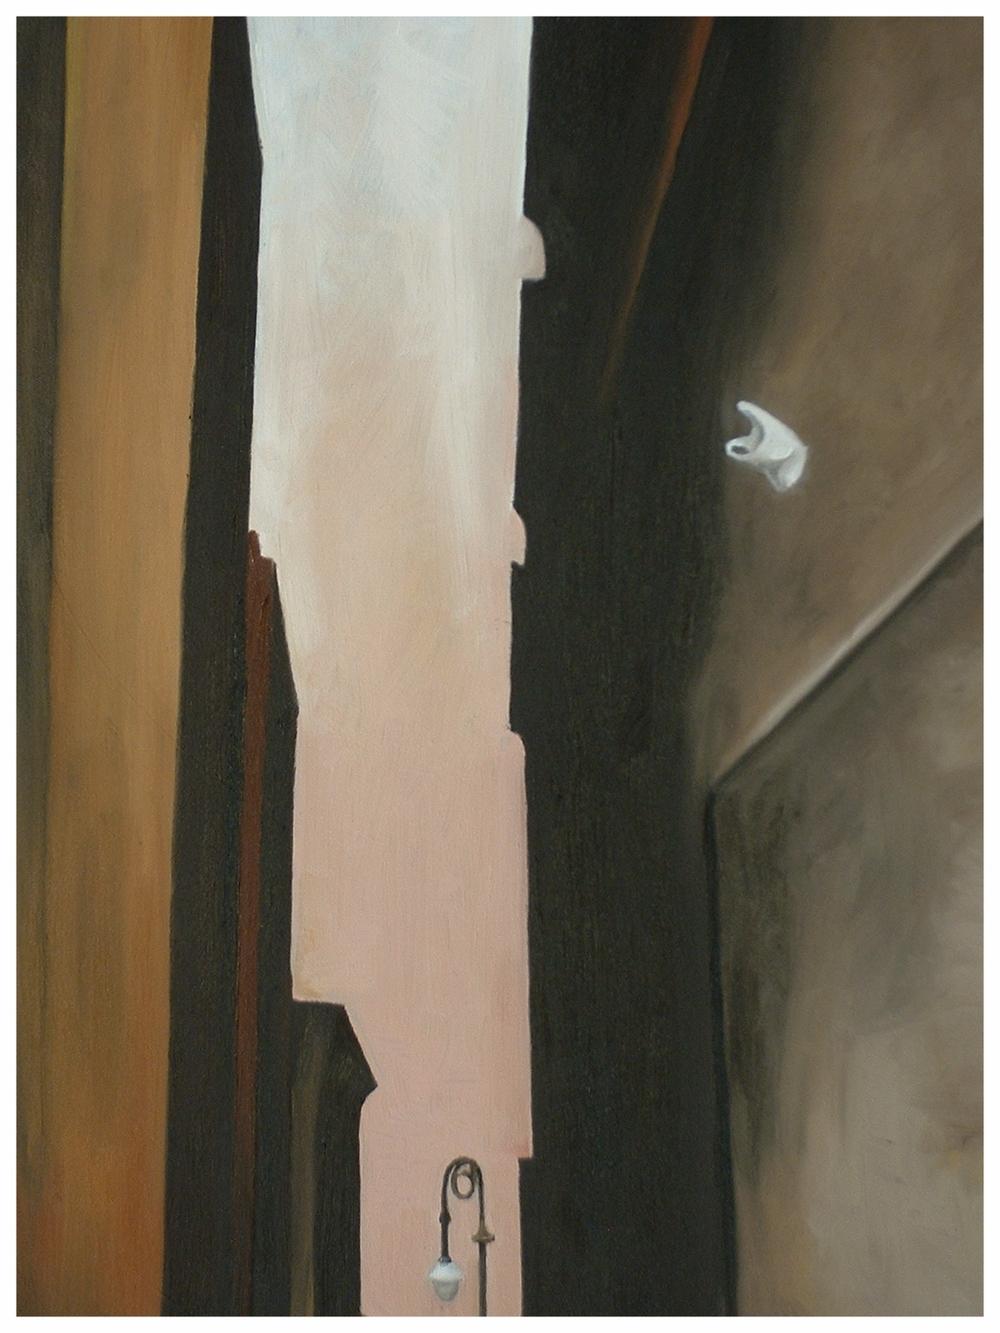 O'Keeffe's Bag (detail)